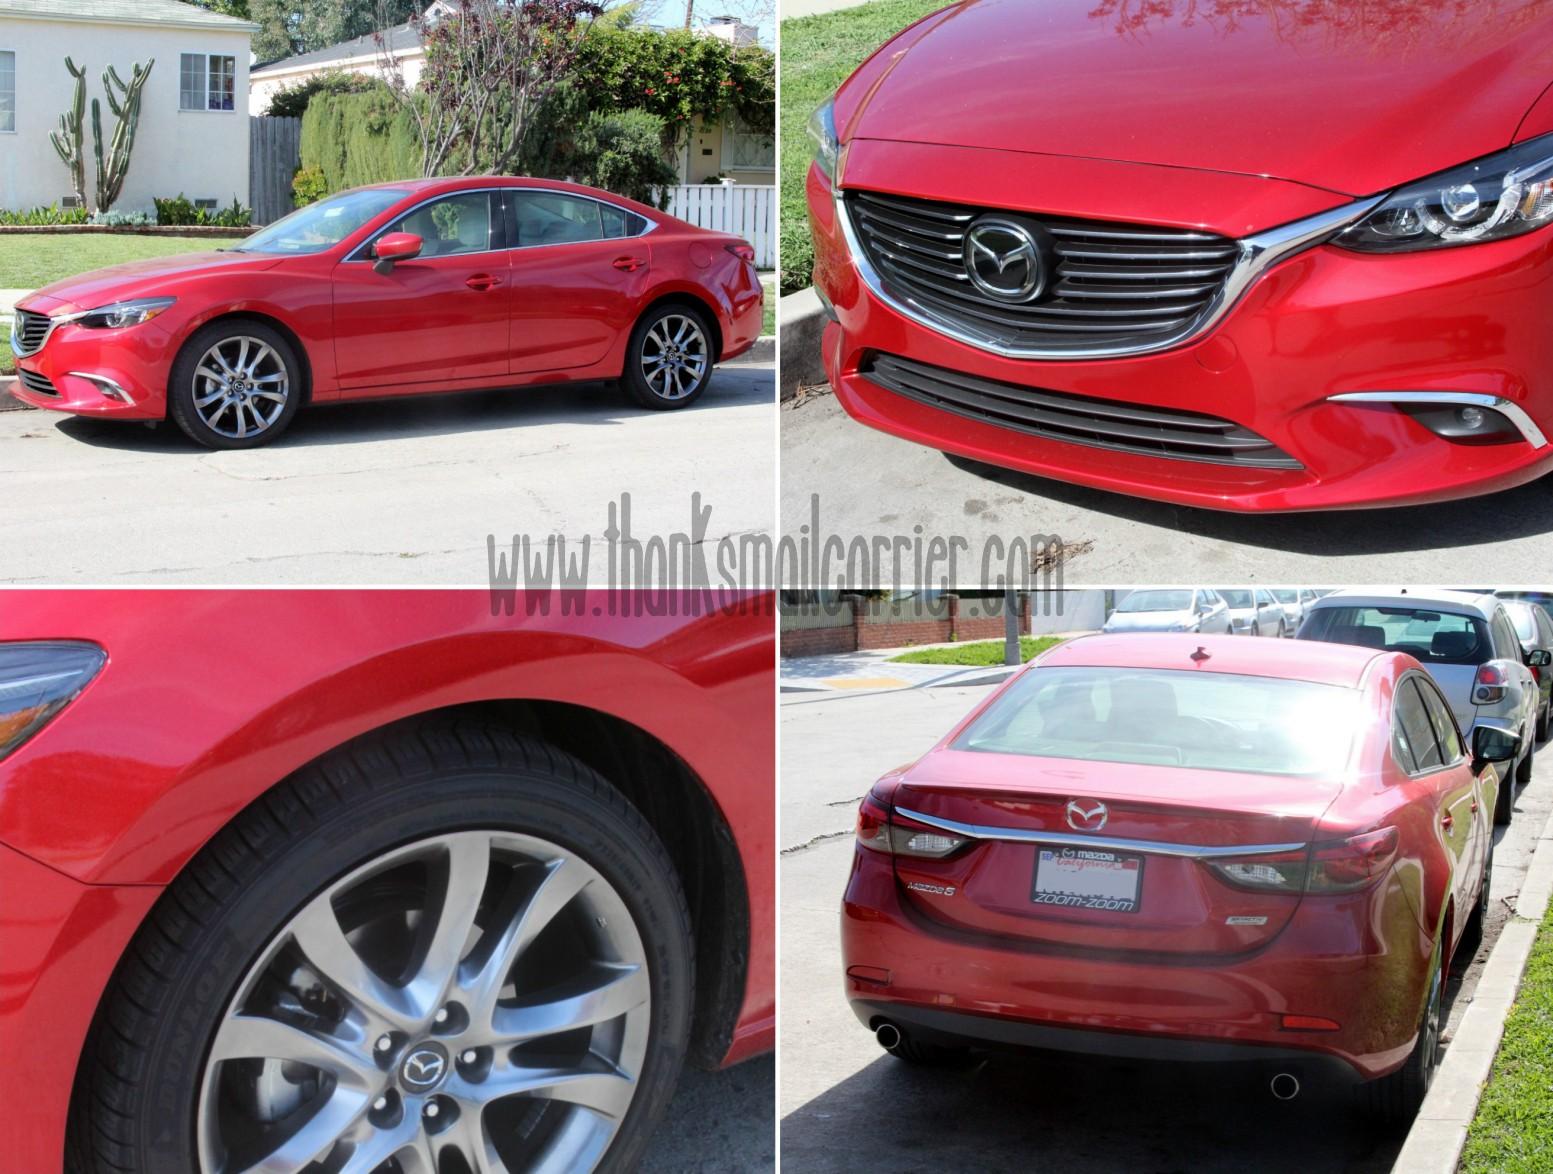 2016 Mazda6 exterior